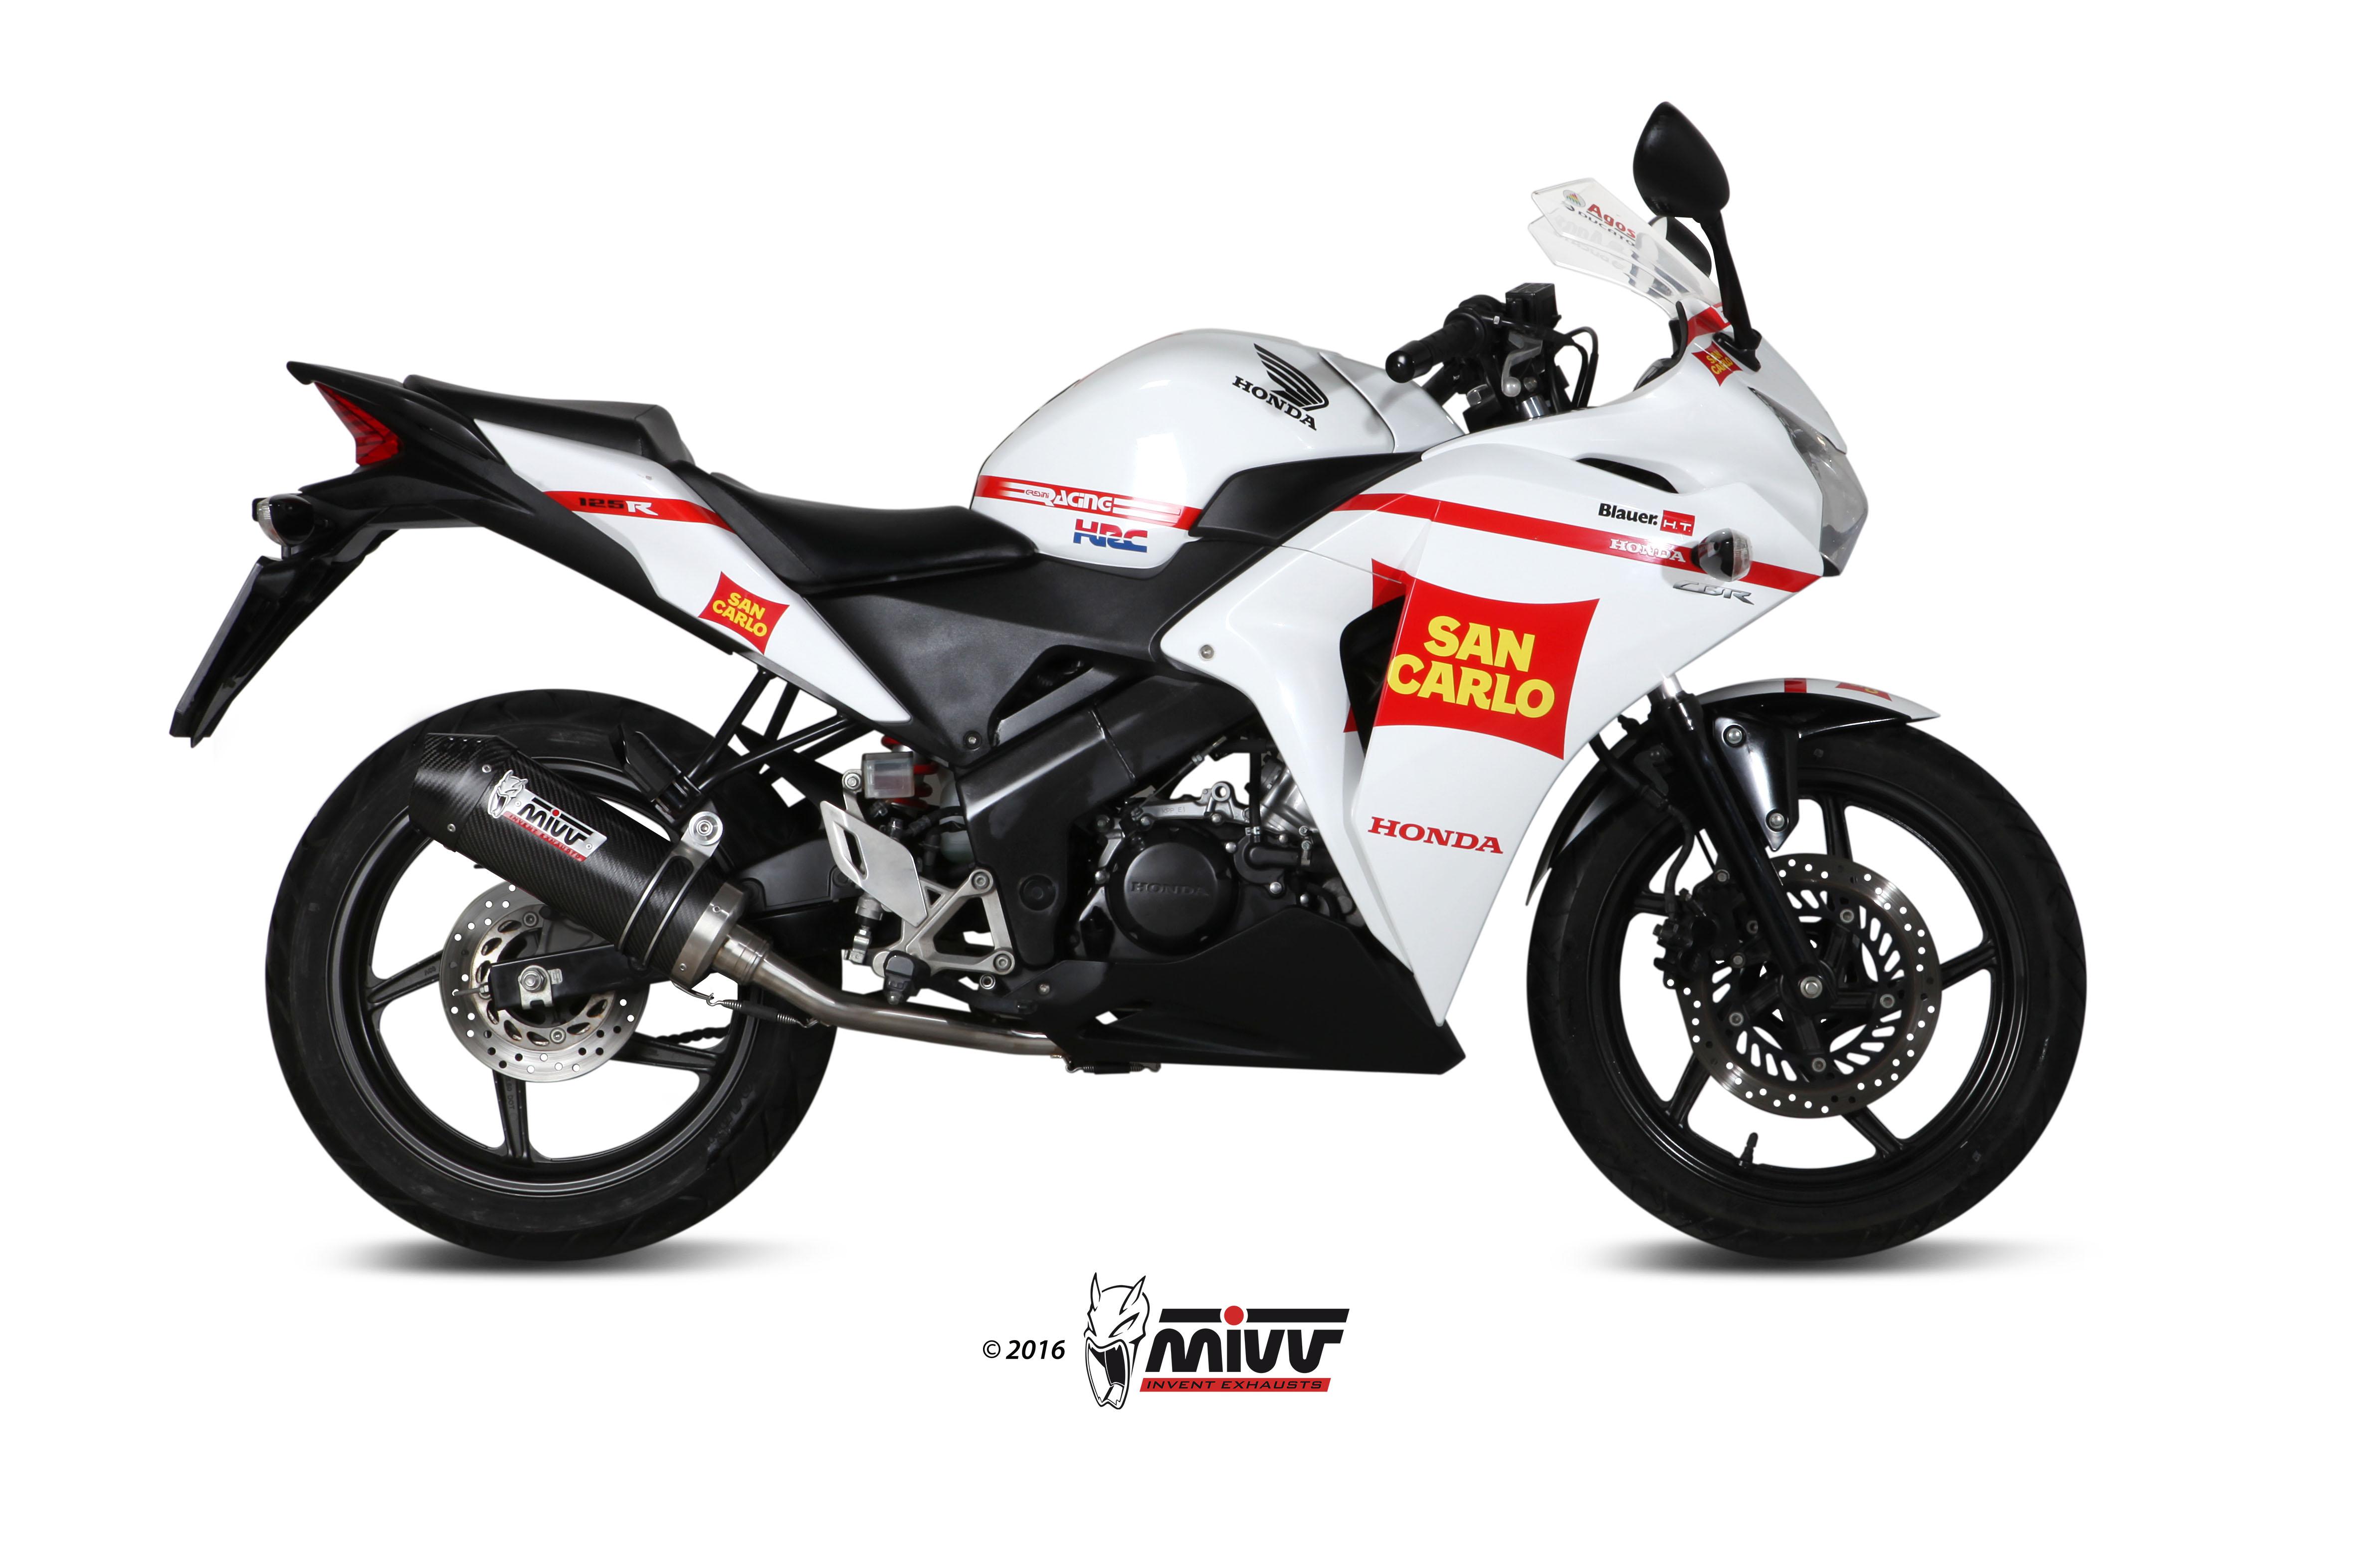 Escape completo homologado Mivv Oval en carbono para Honda CBR 125R 2011>